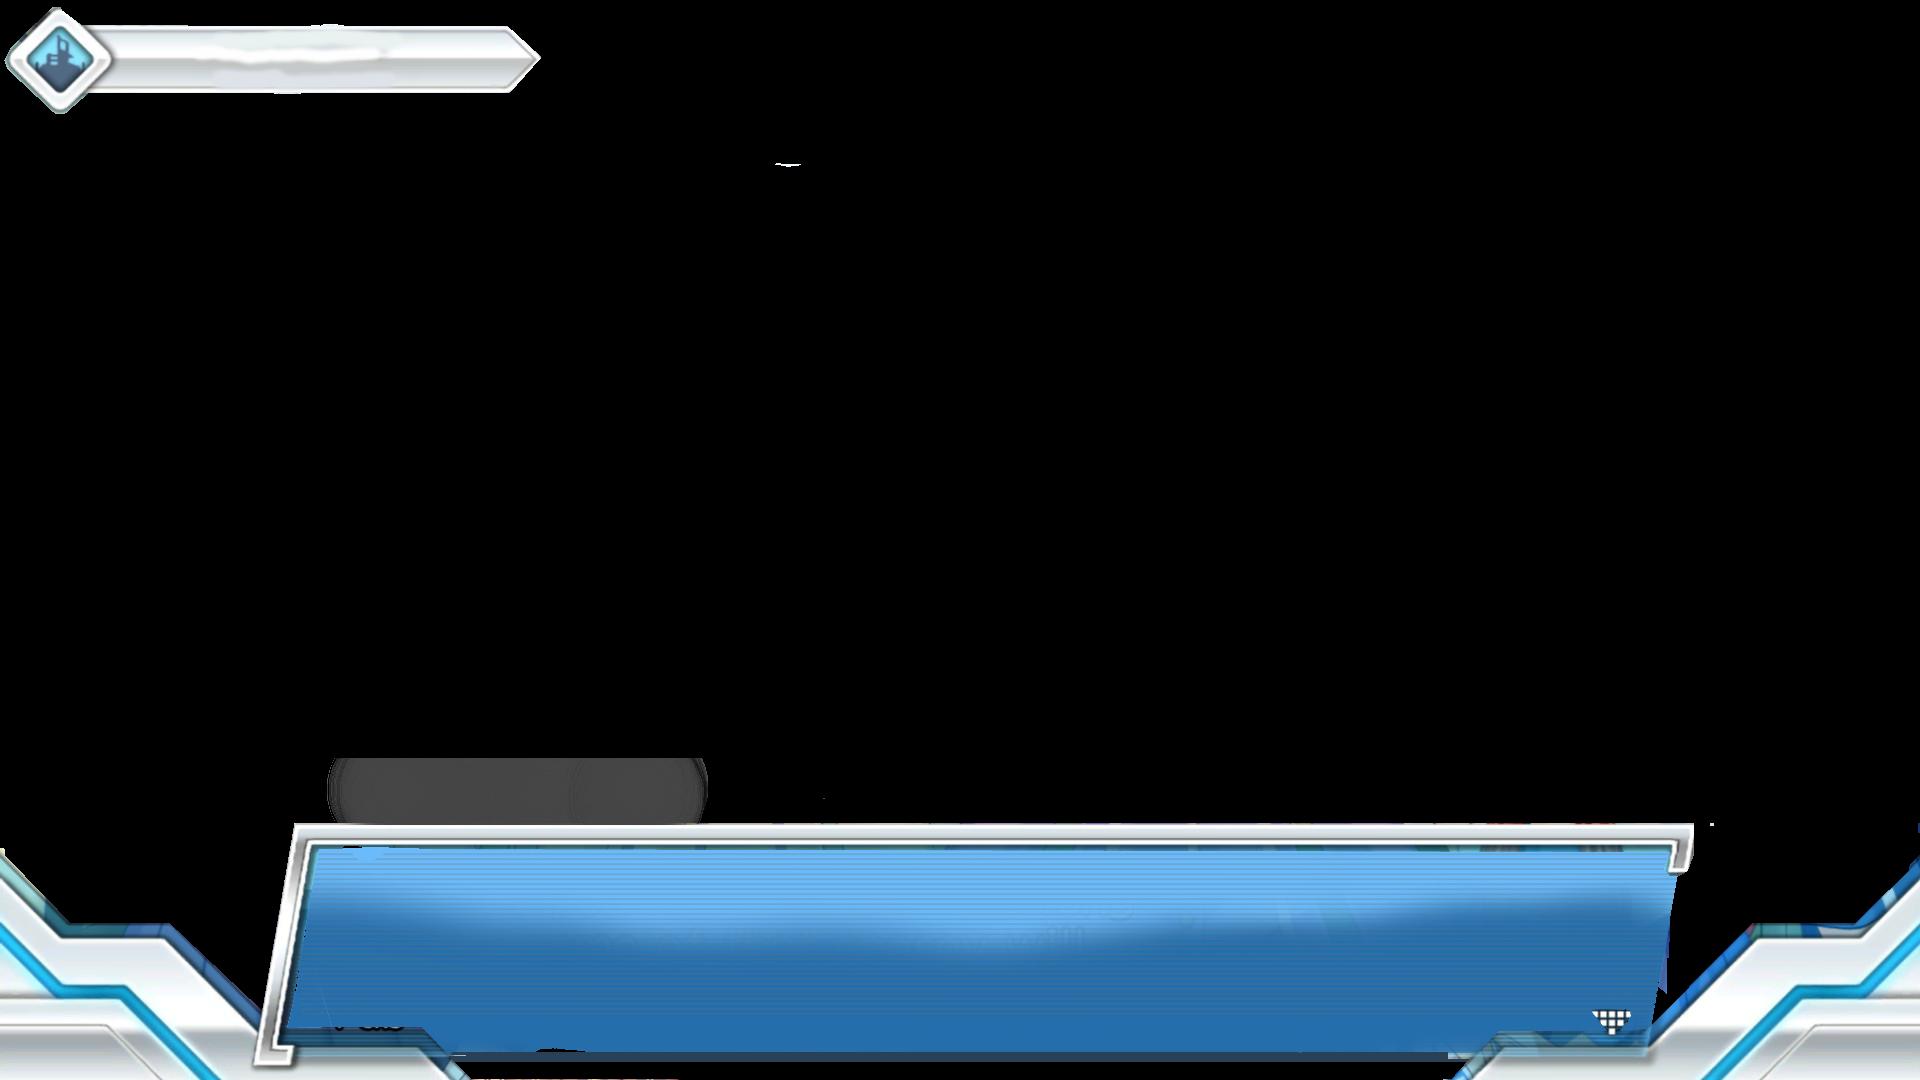 Megatagmension Blanc Text Box by NickTheGamemaster on ...